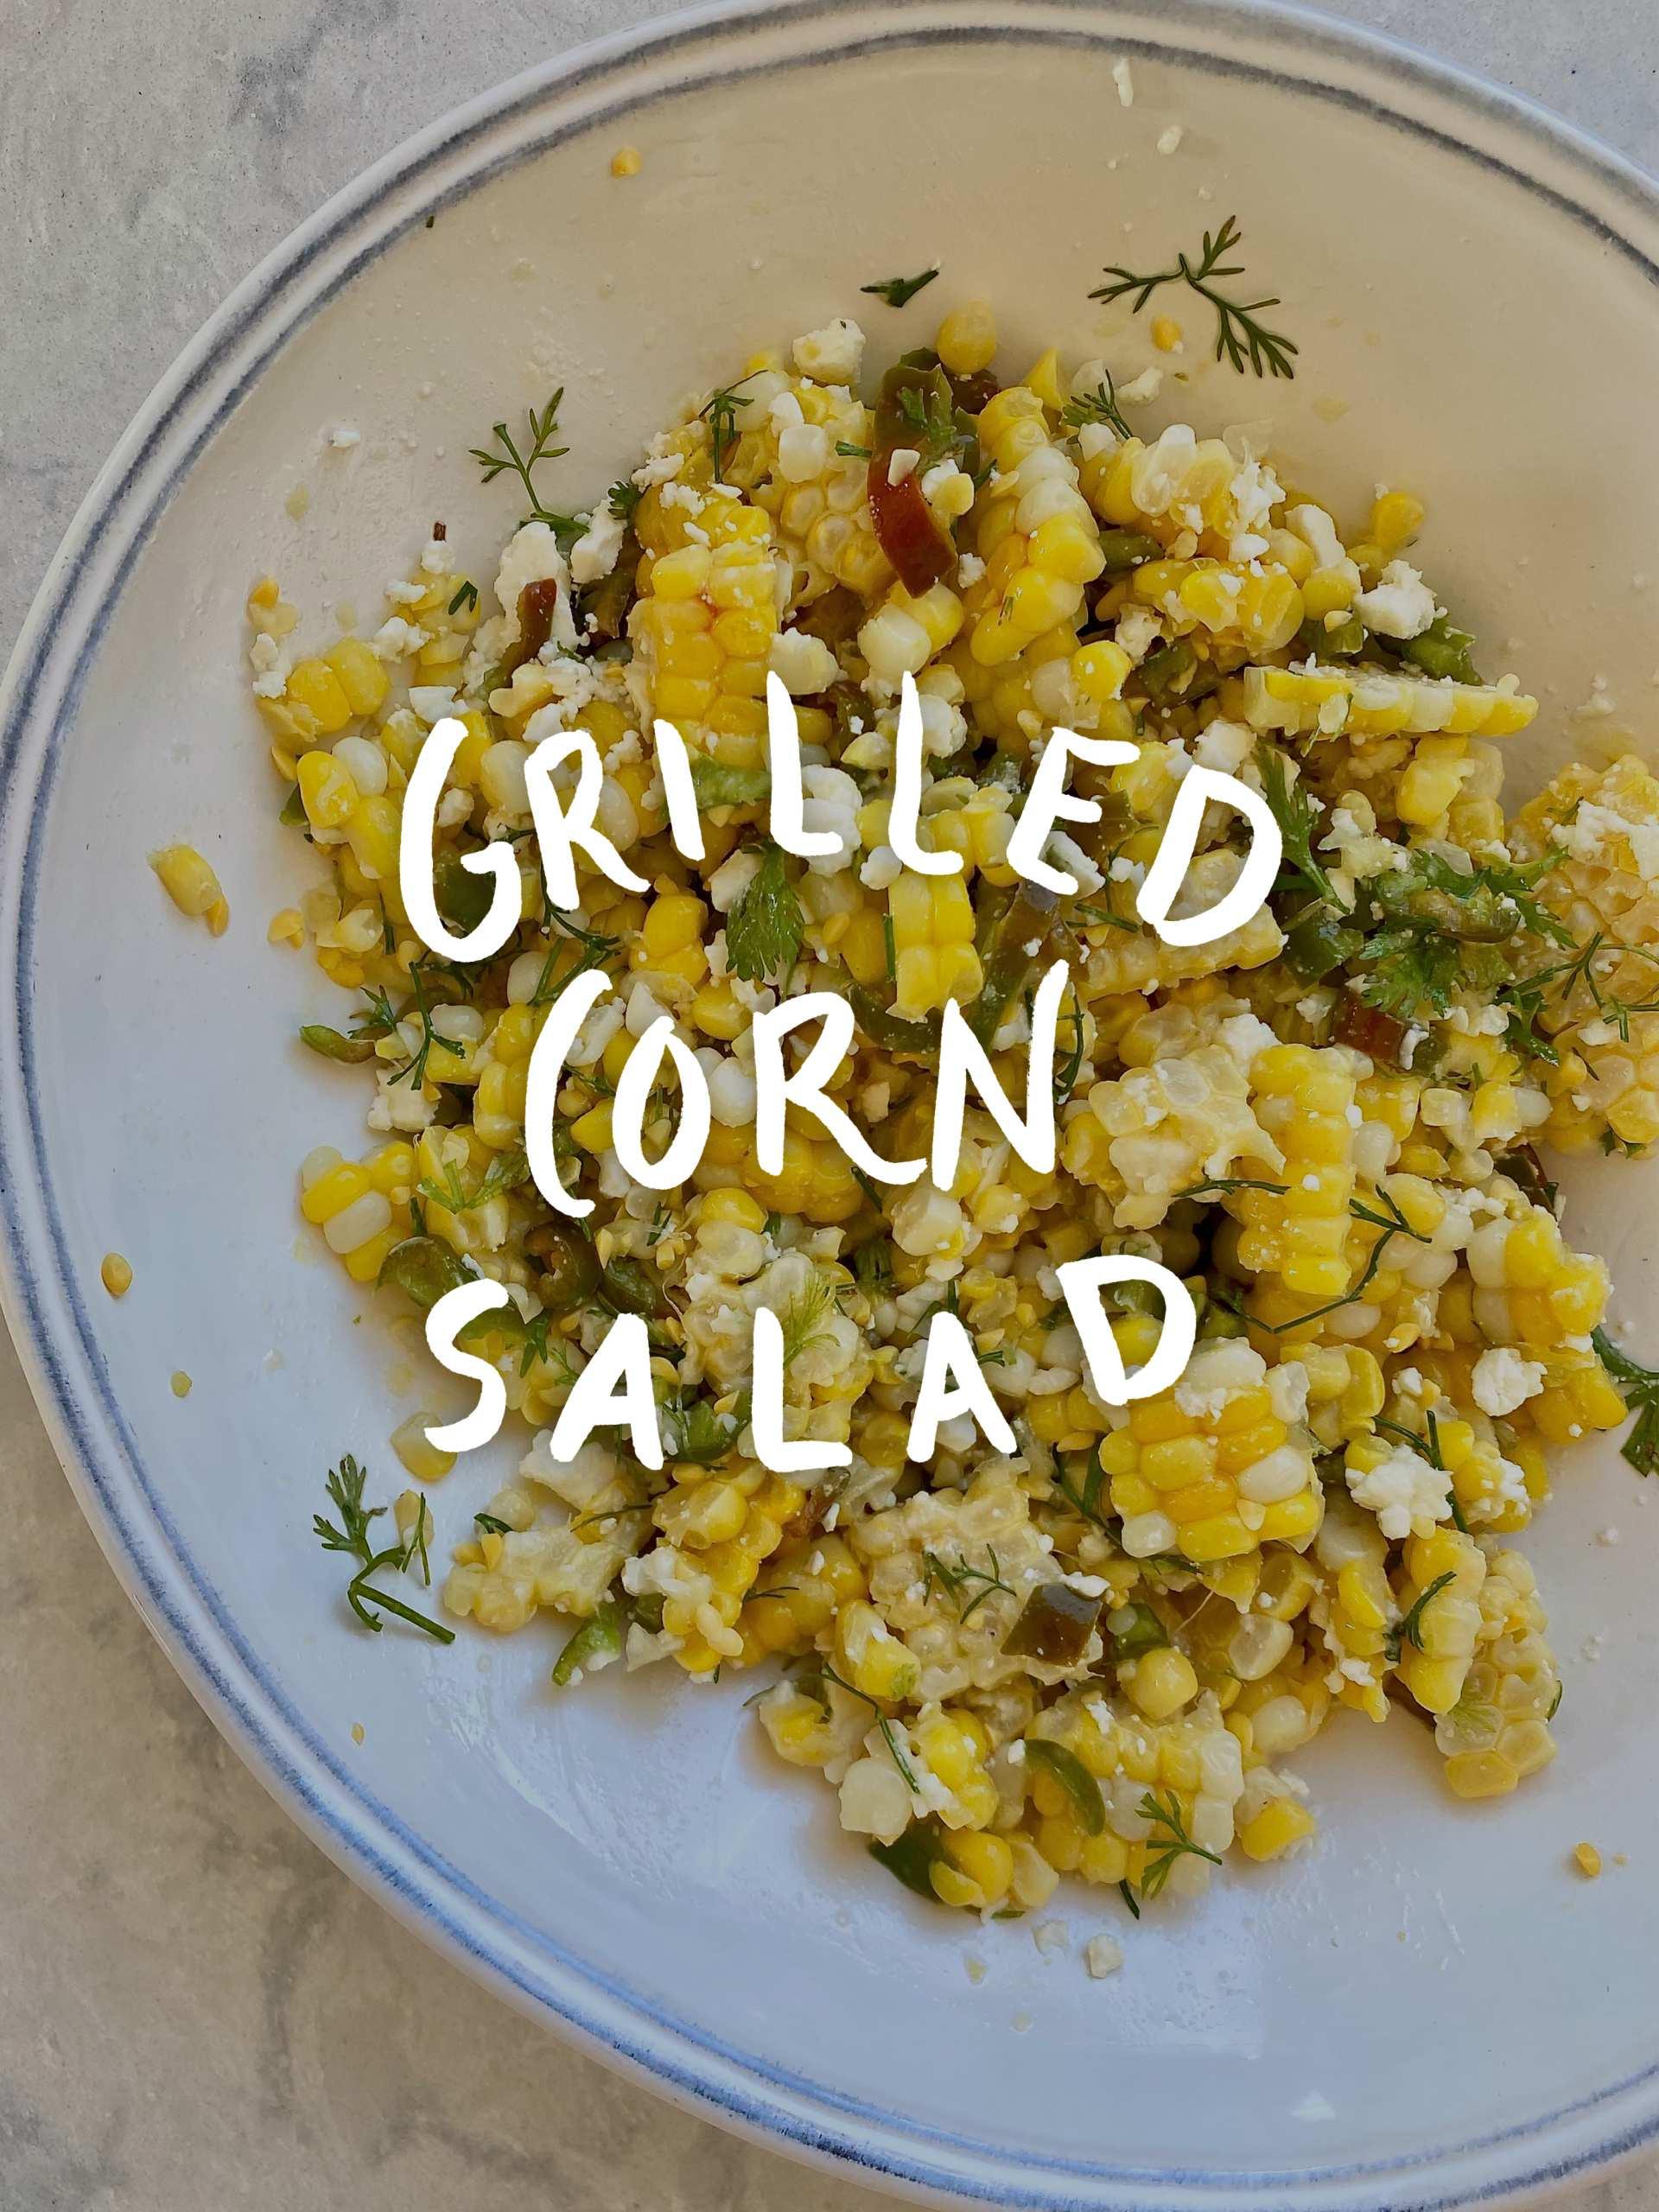 Best Grilled Corn Salad Recipe - a bowl of grilled corn salad